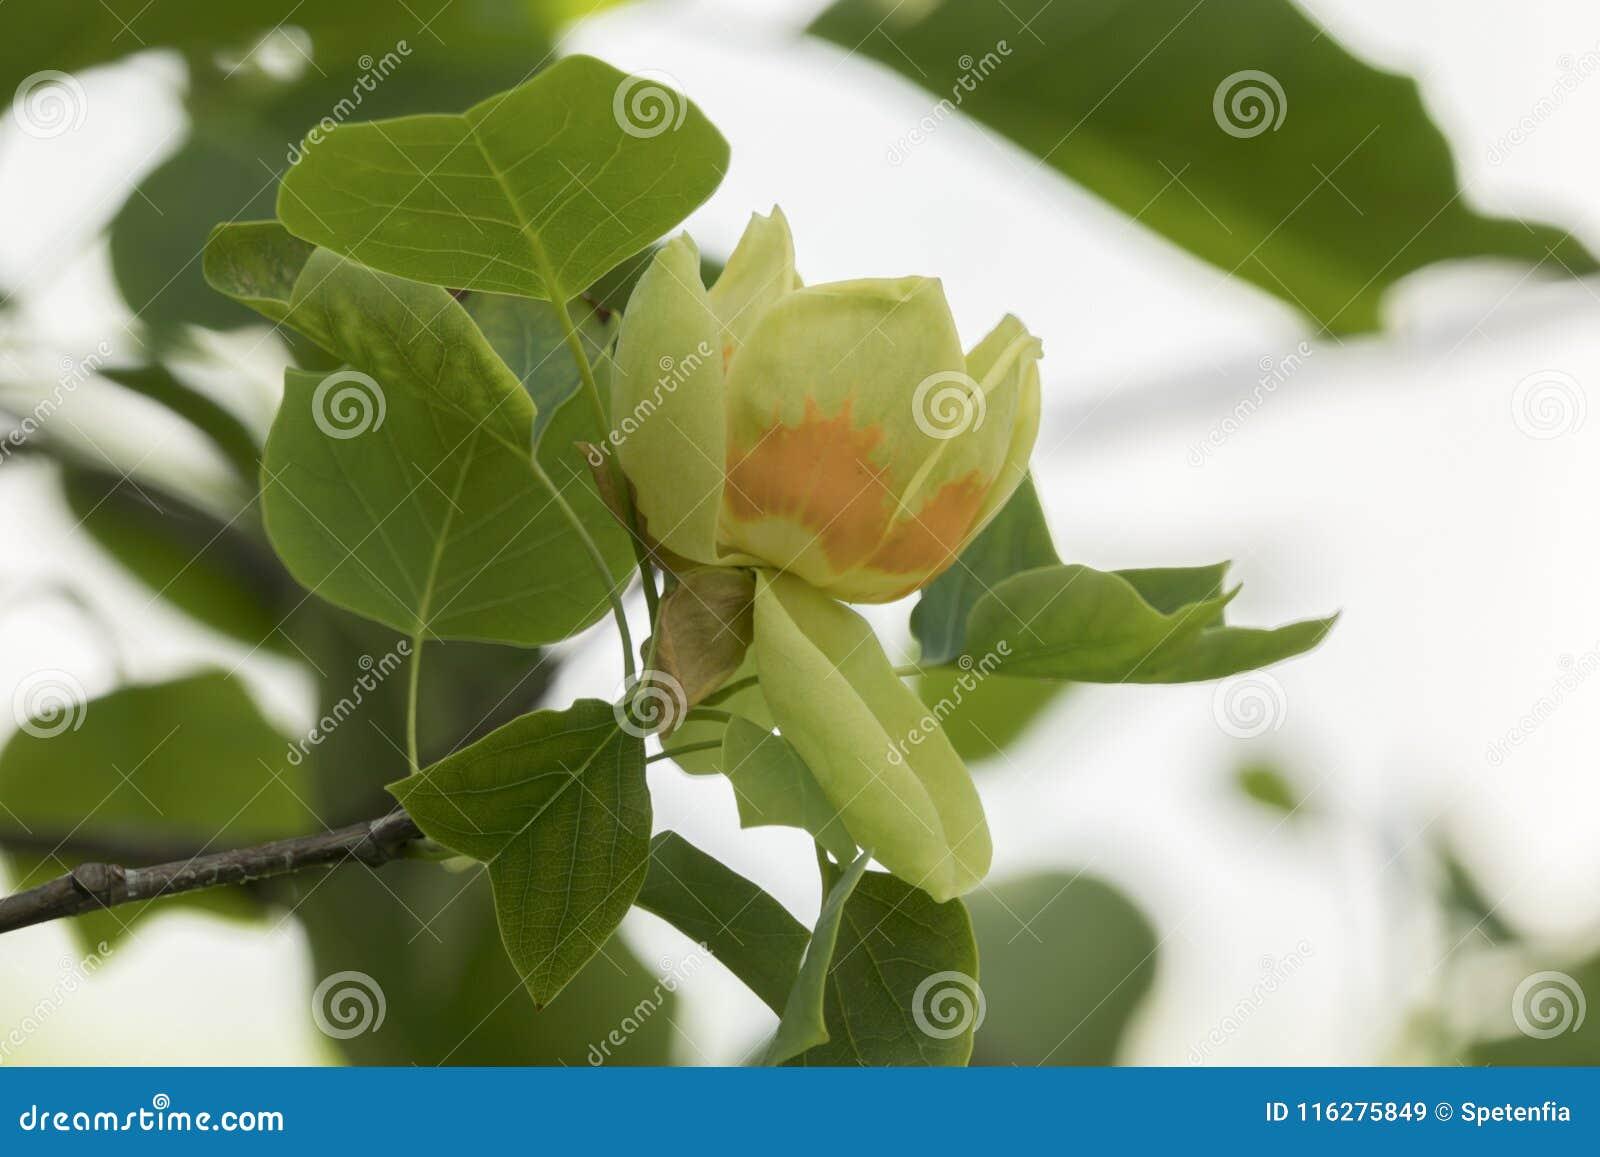 Tulip Tree In Bloom Stock Image Image Of Ornamental 116275849